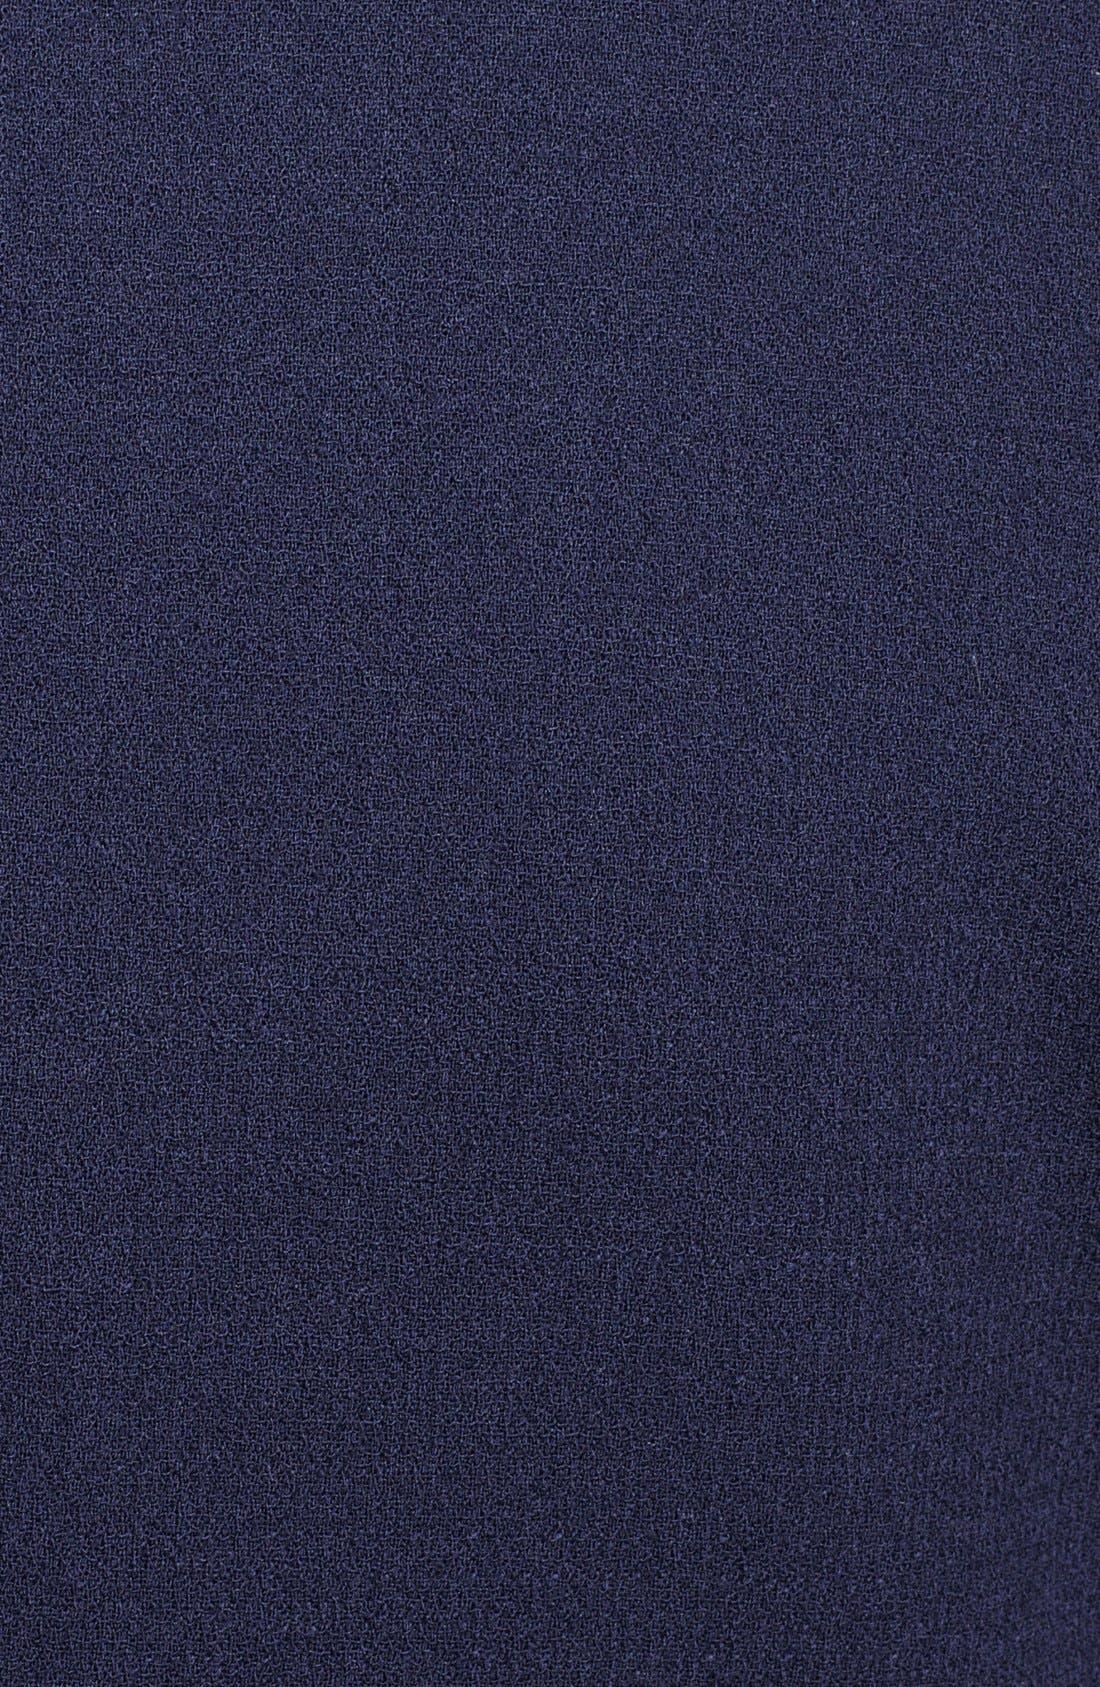 Alternate Image 3  - Michael Kors Bouclé Stretch Wool Jacket